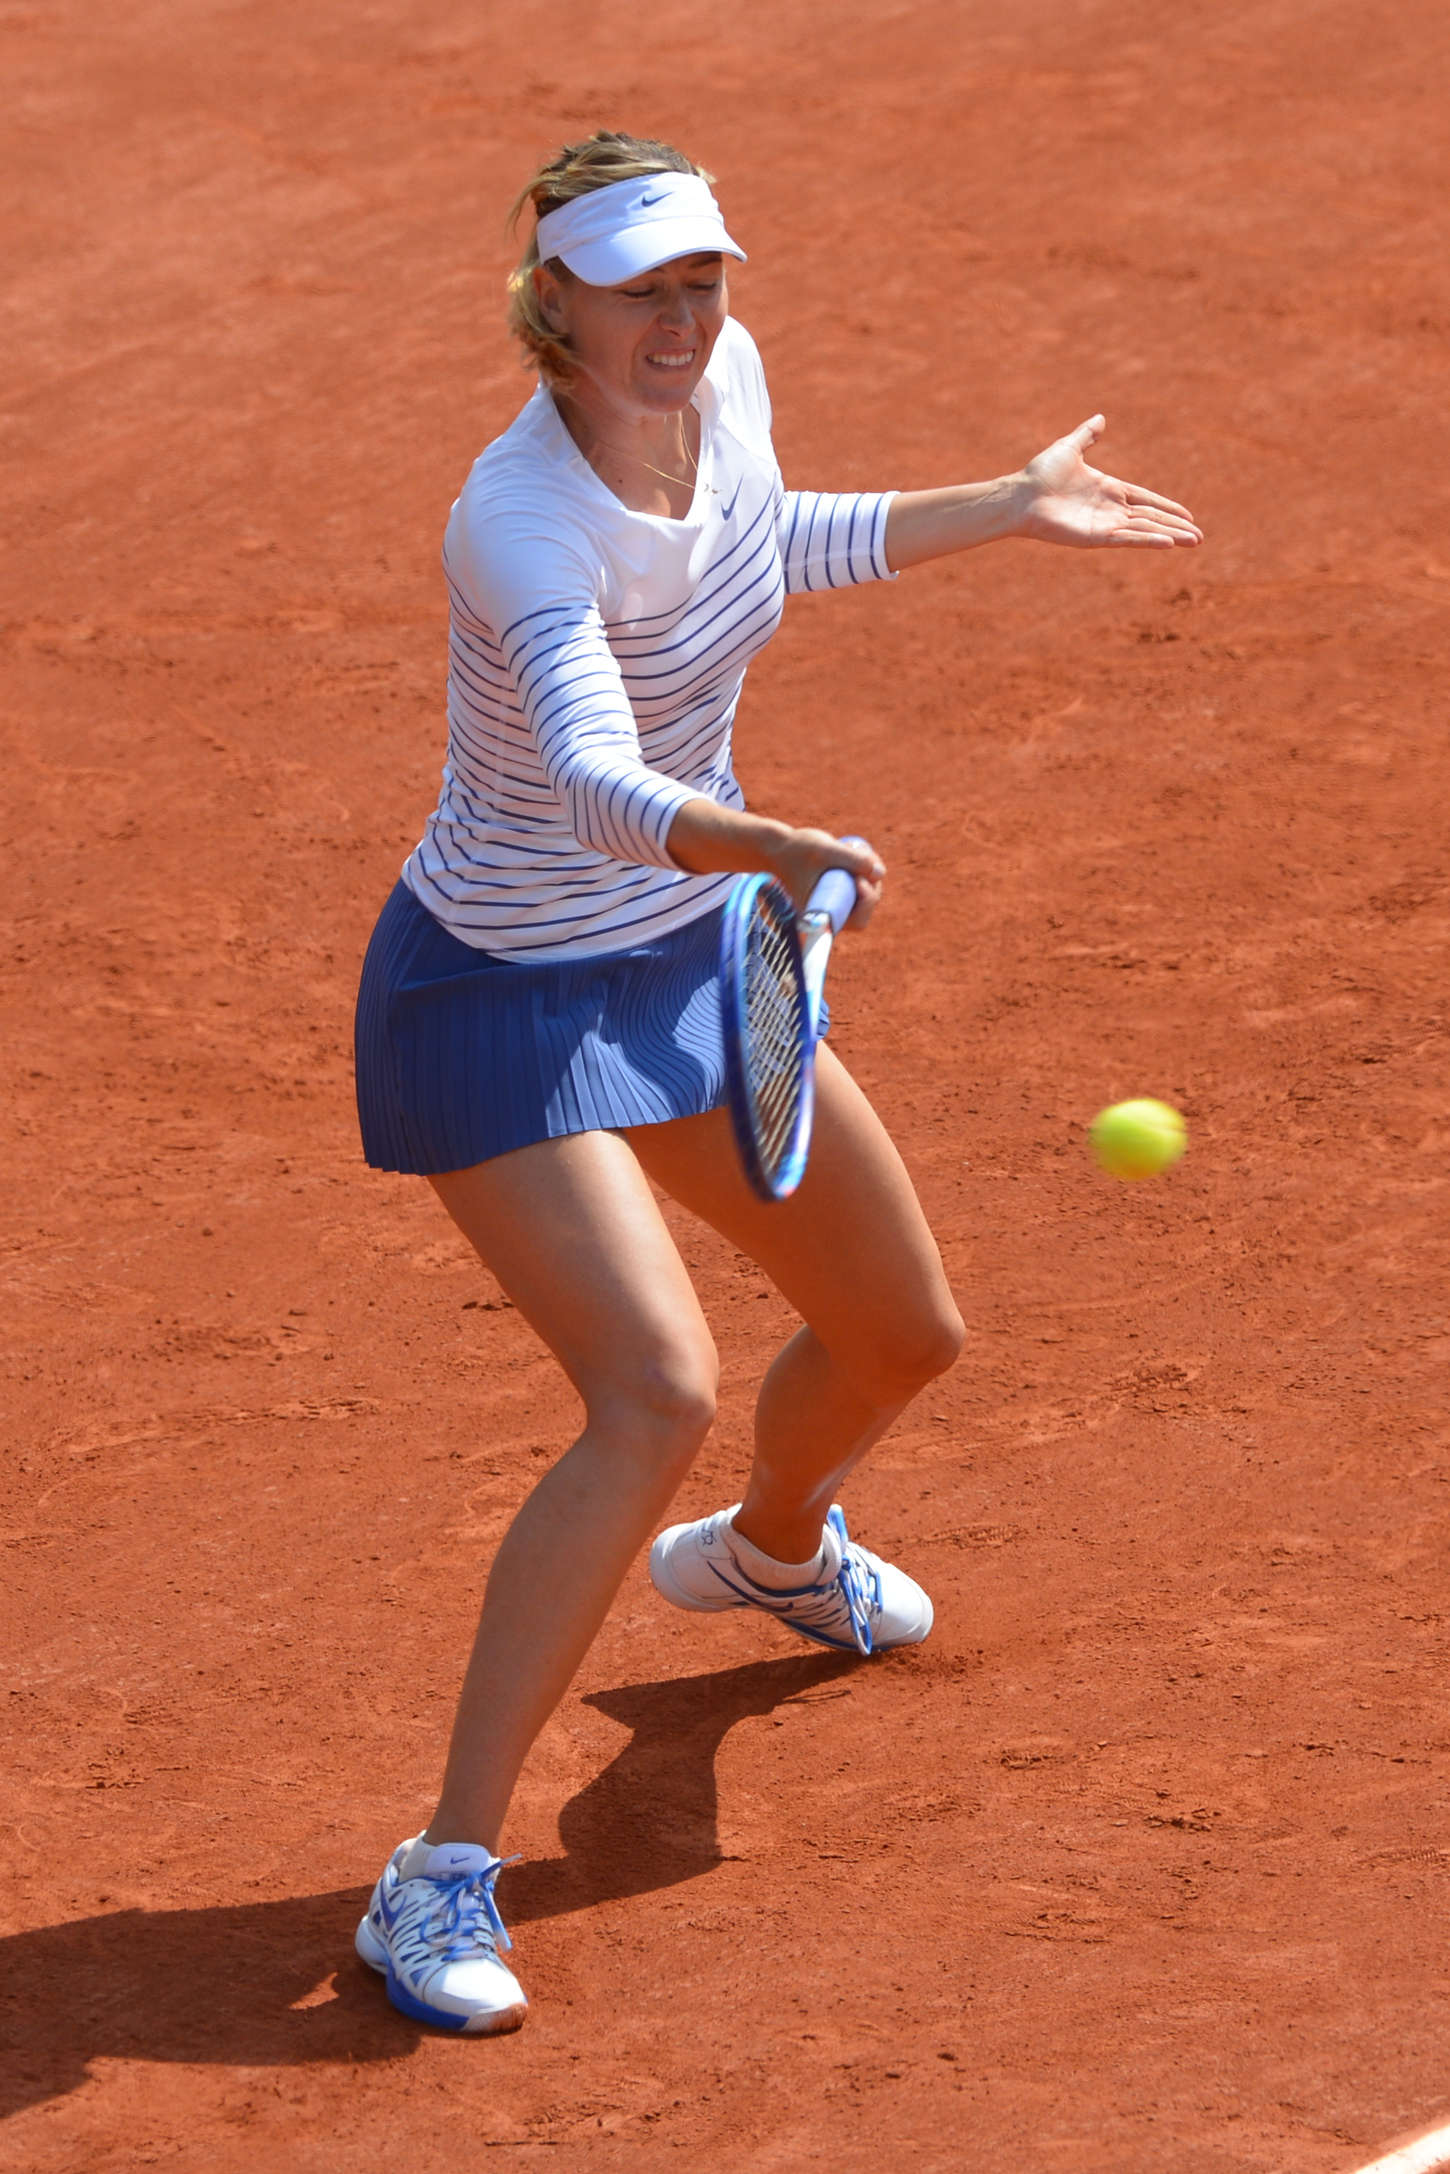 Maria Sharapova - 2015 French Open in Paris